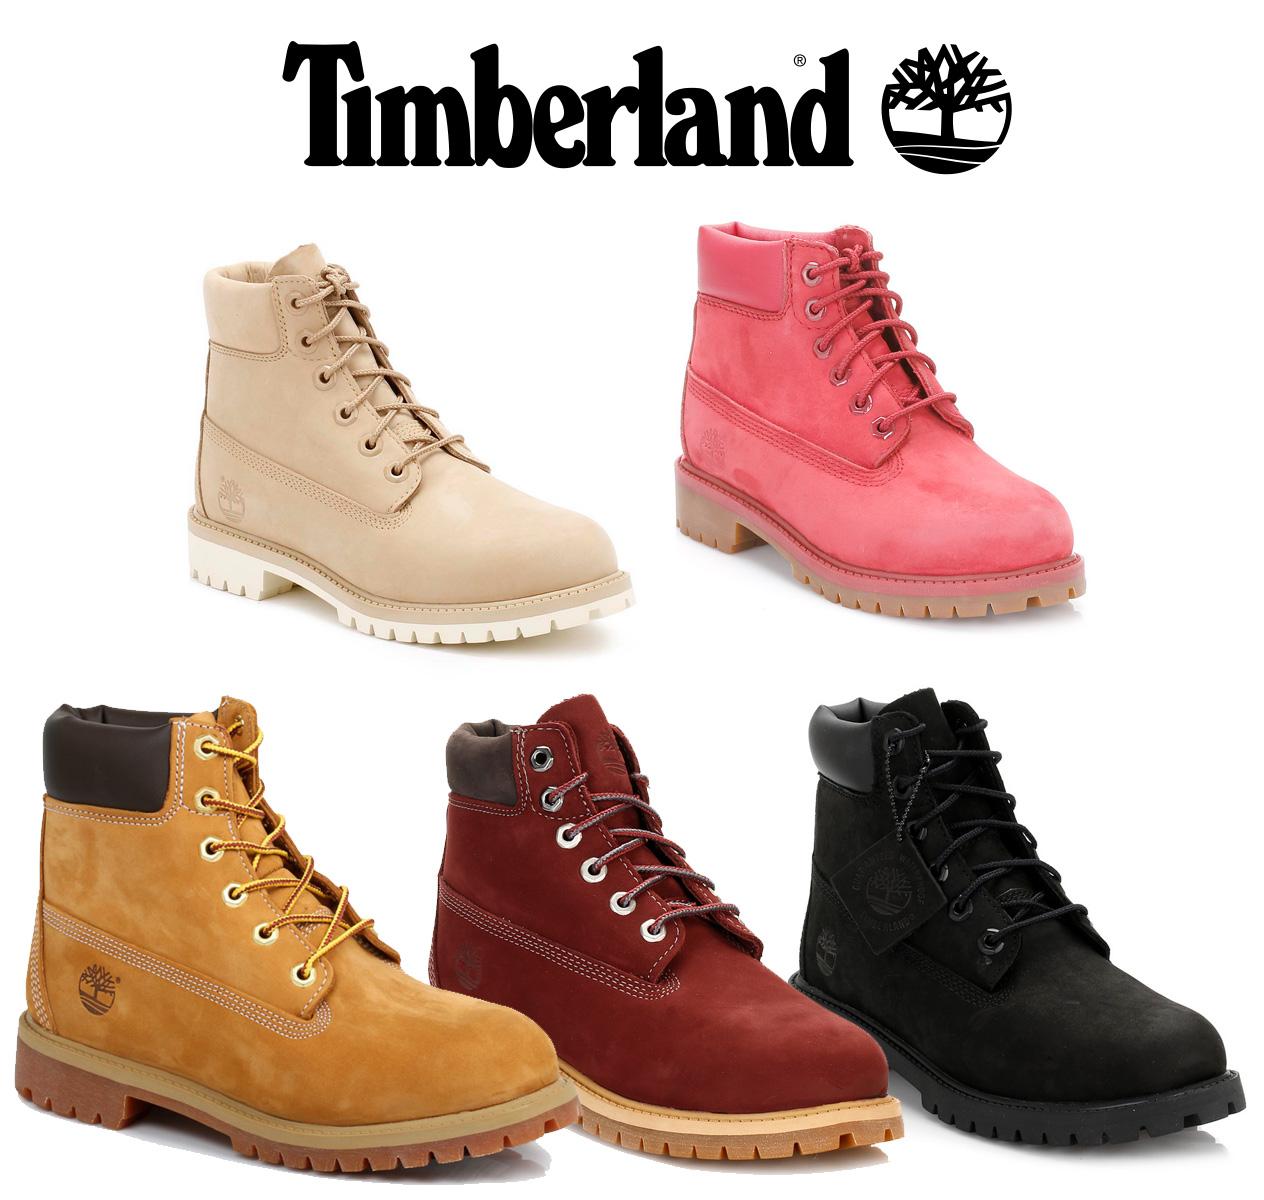 Timberland Kids Boots Original 6 Inch Premium N9999 Juniors